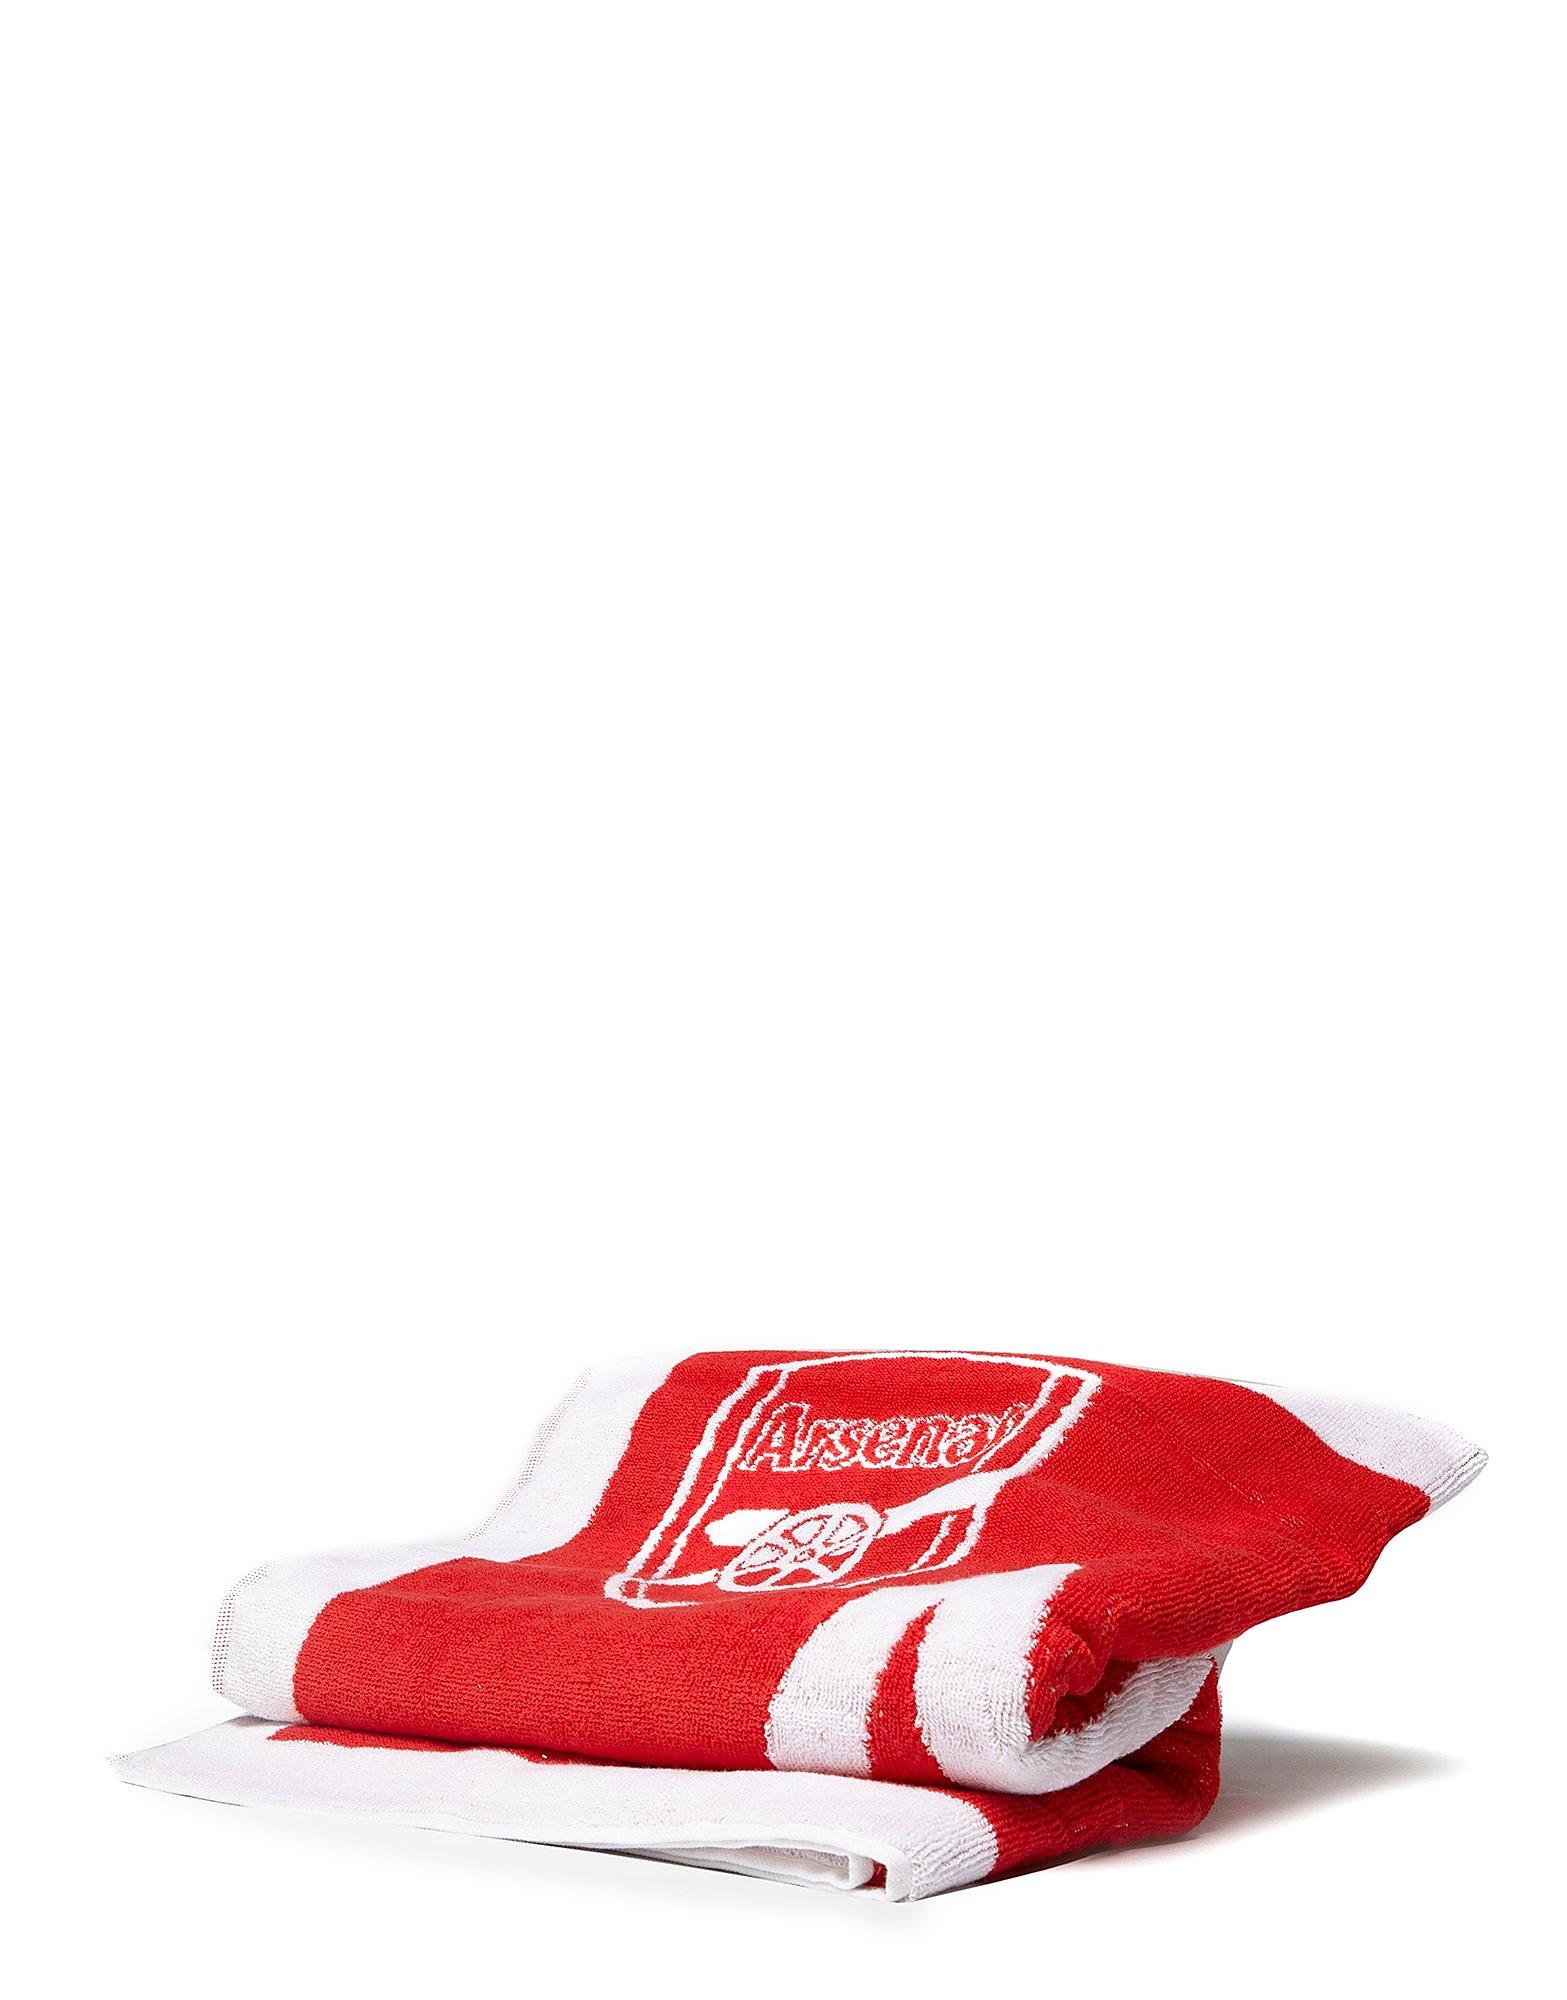 PUMA Arsenal FC Beach Towel